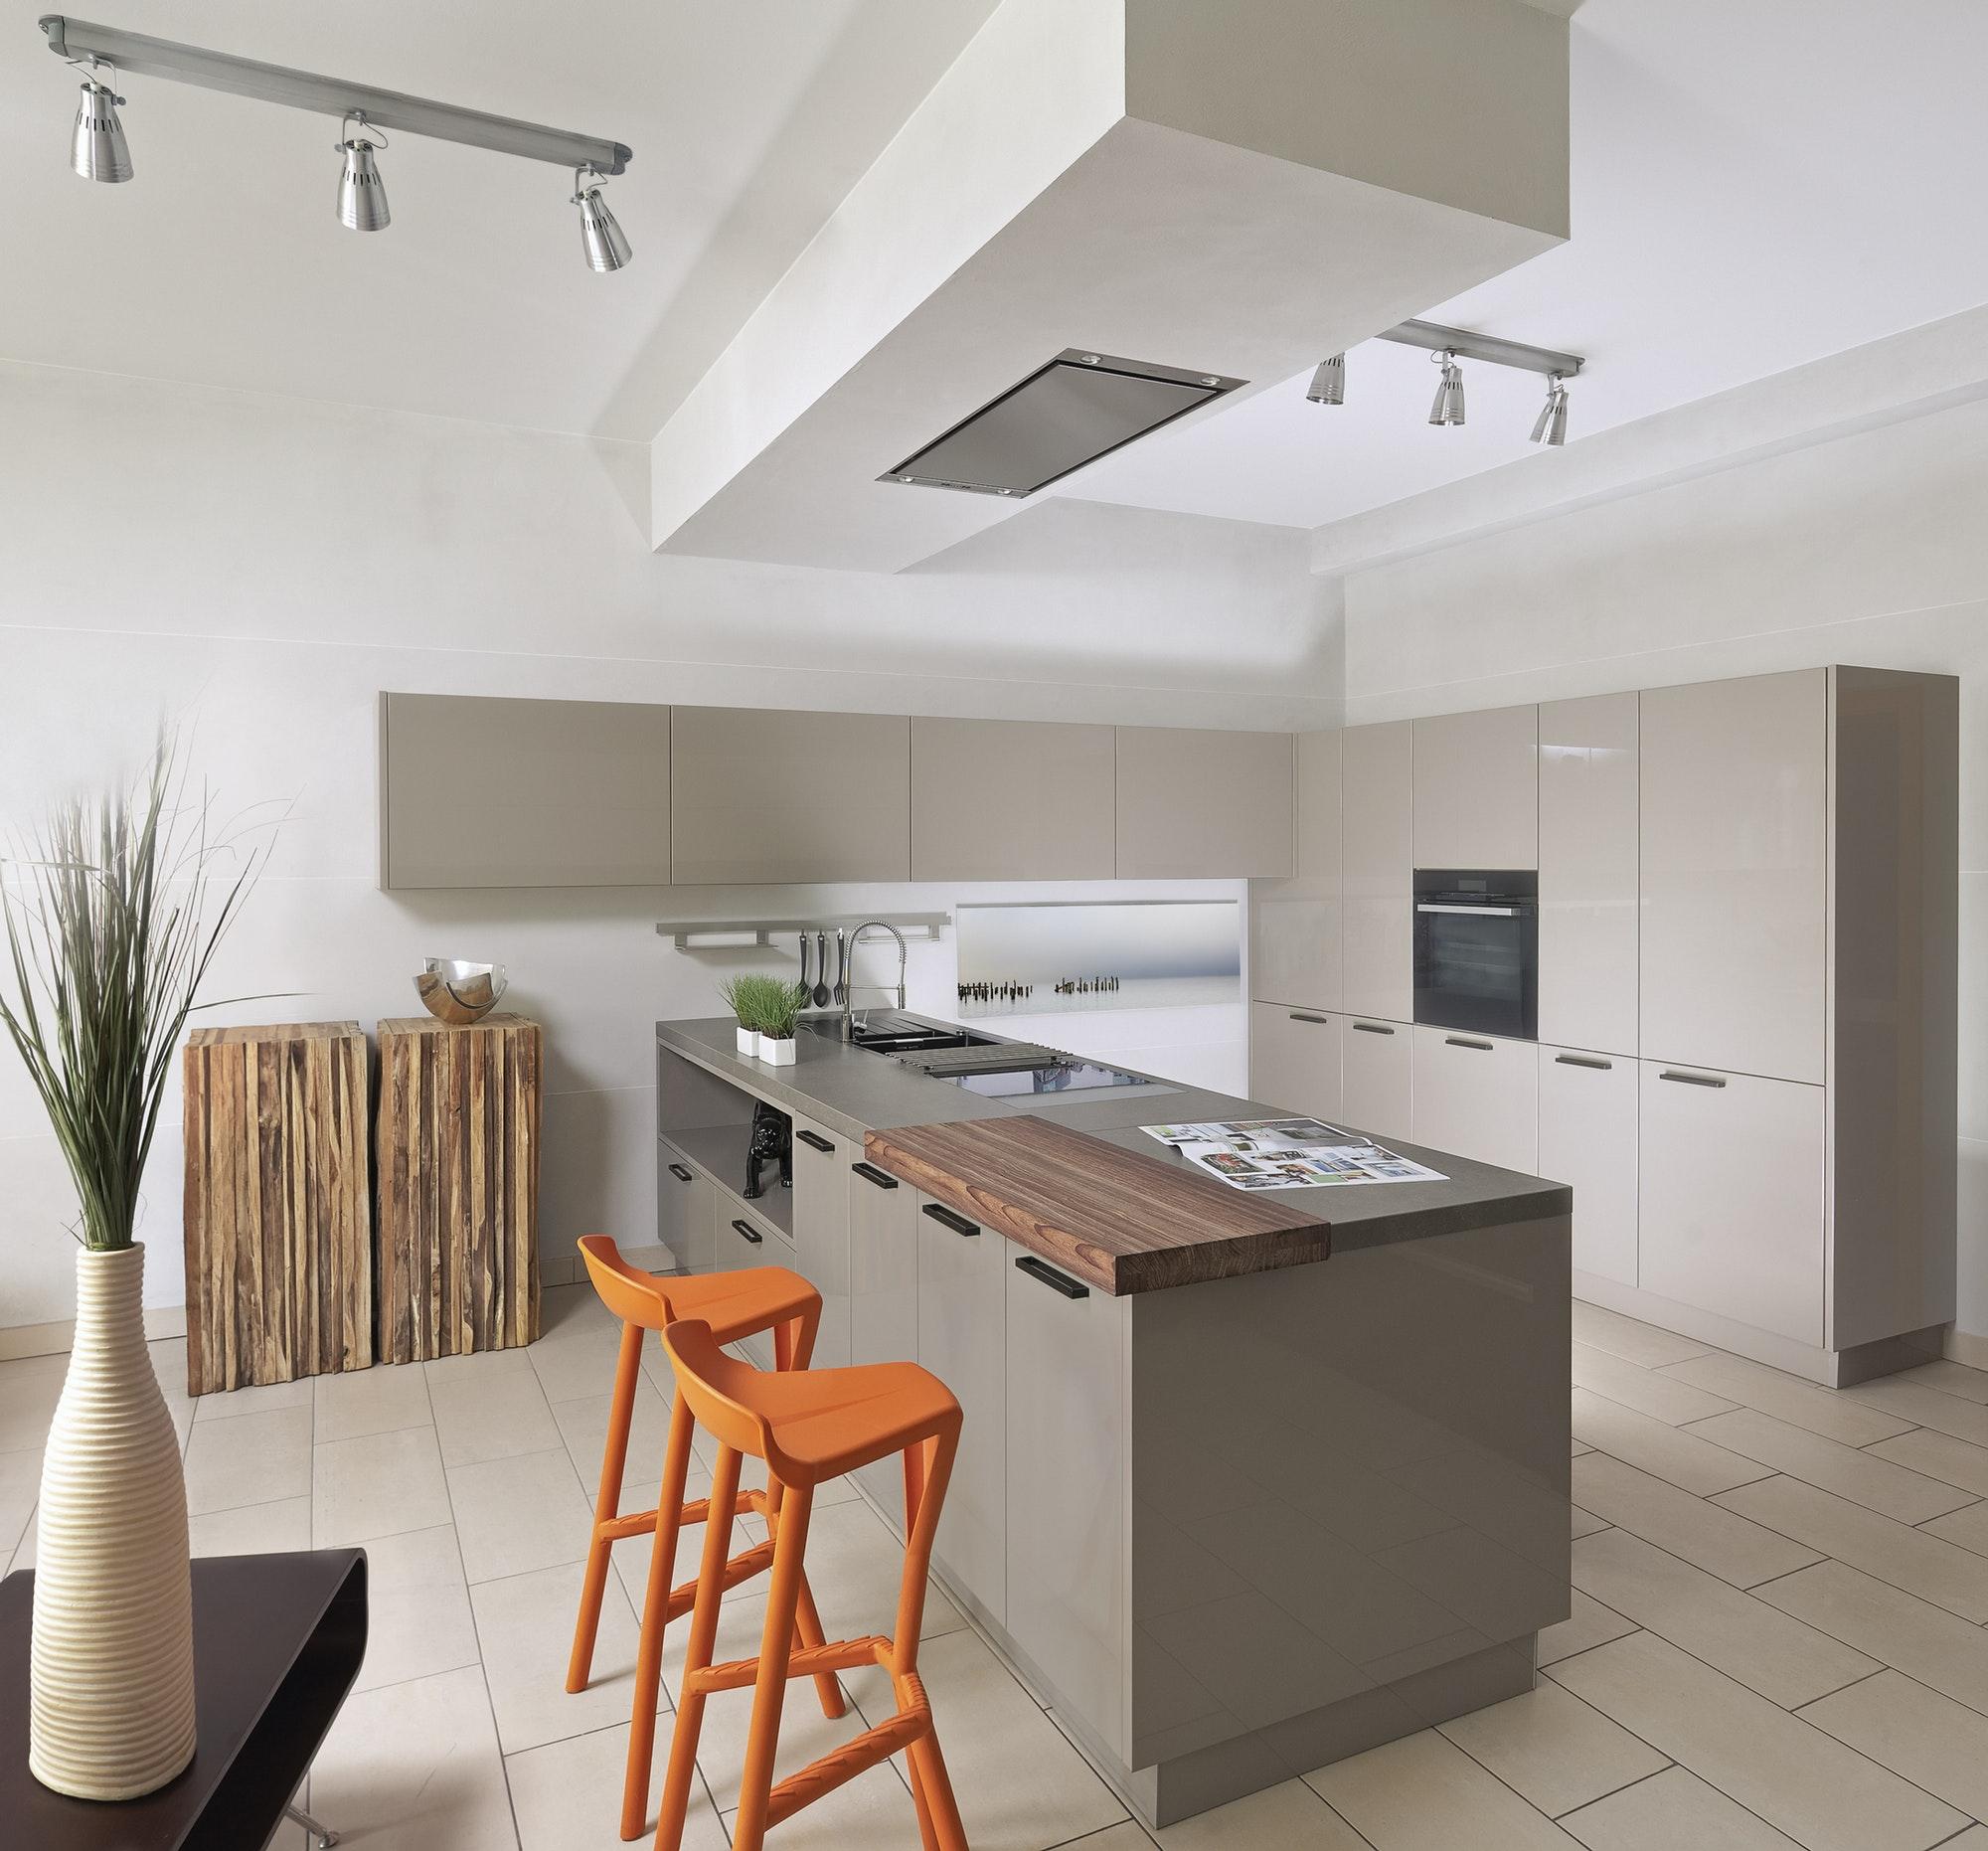 Encimeras Las Palmas Countertop and cabinets in modern kitchen